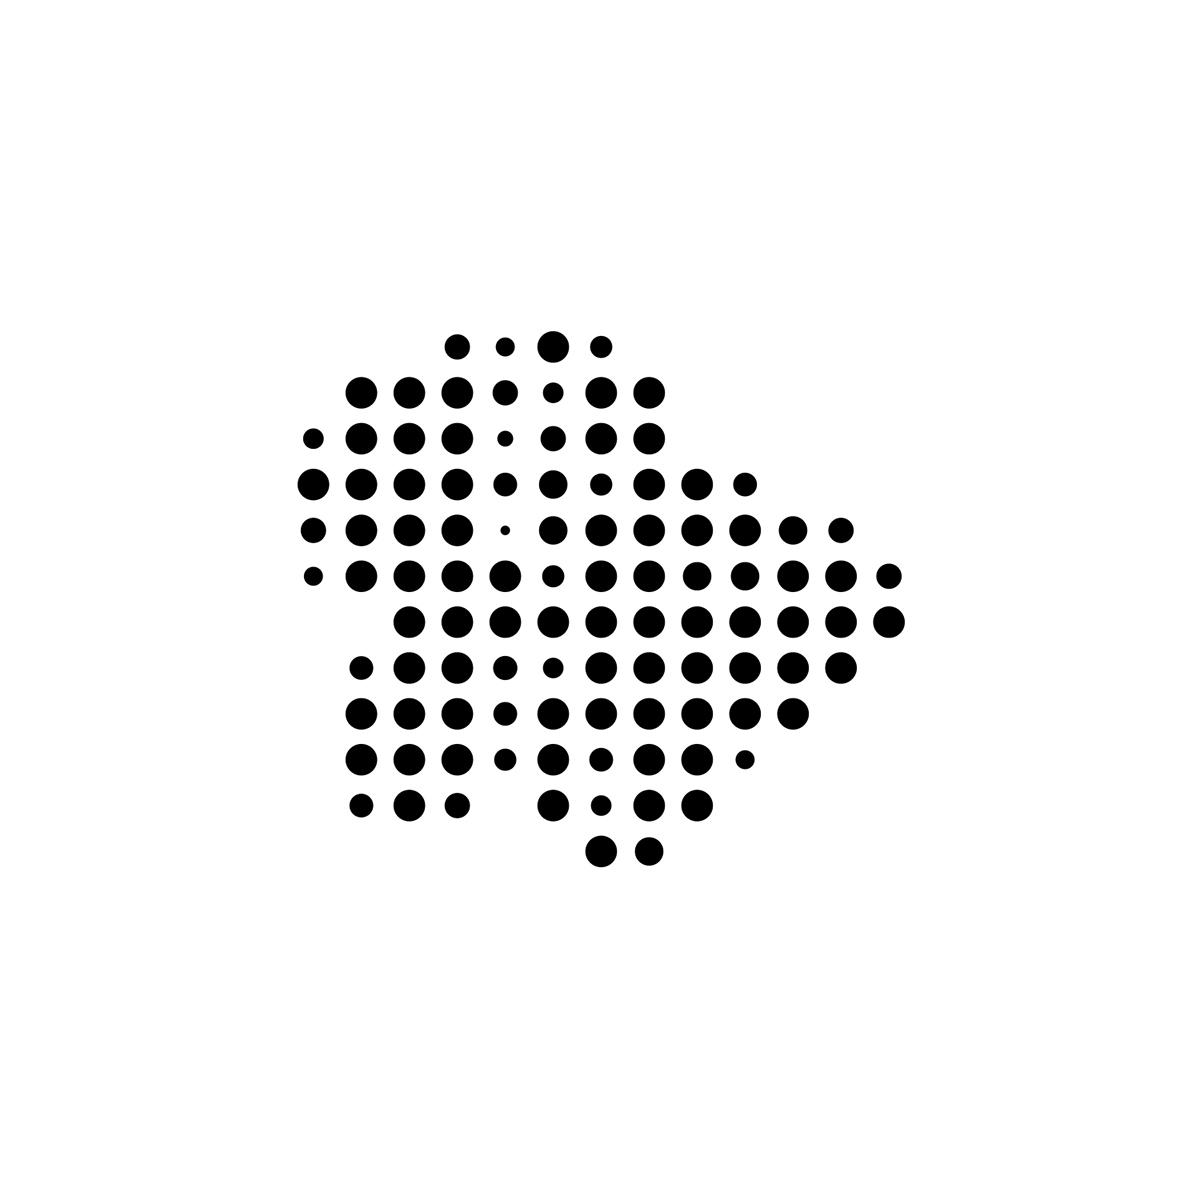 Budapest Design Map, 2013 on Behance